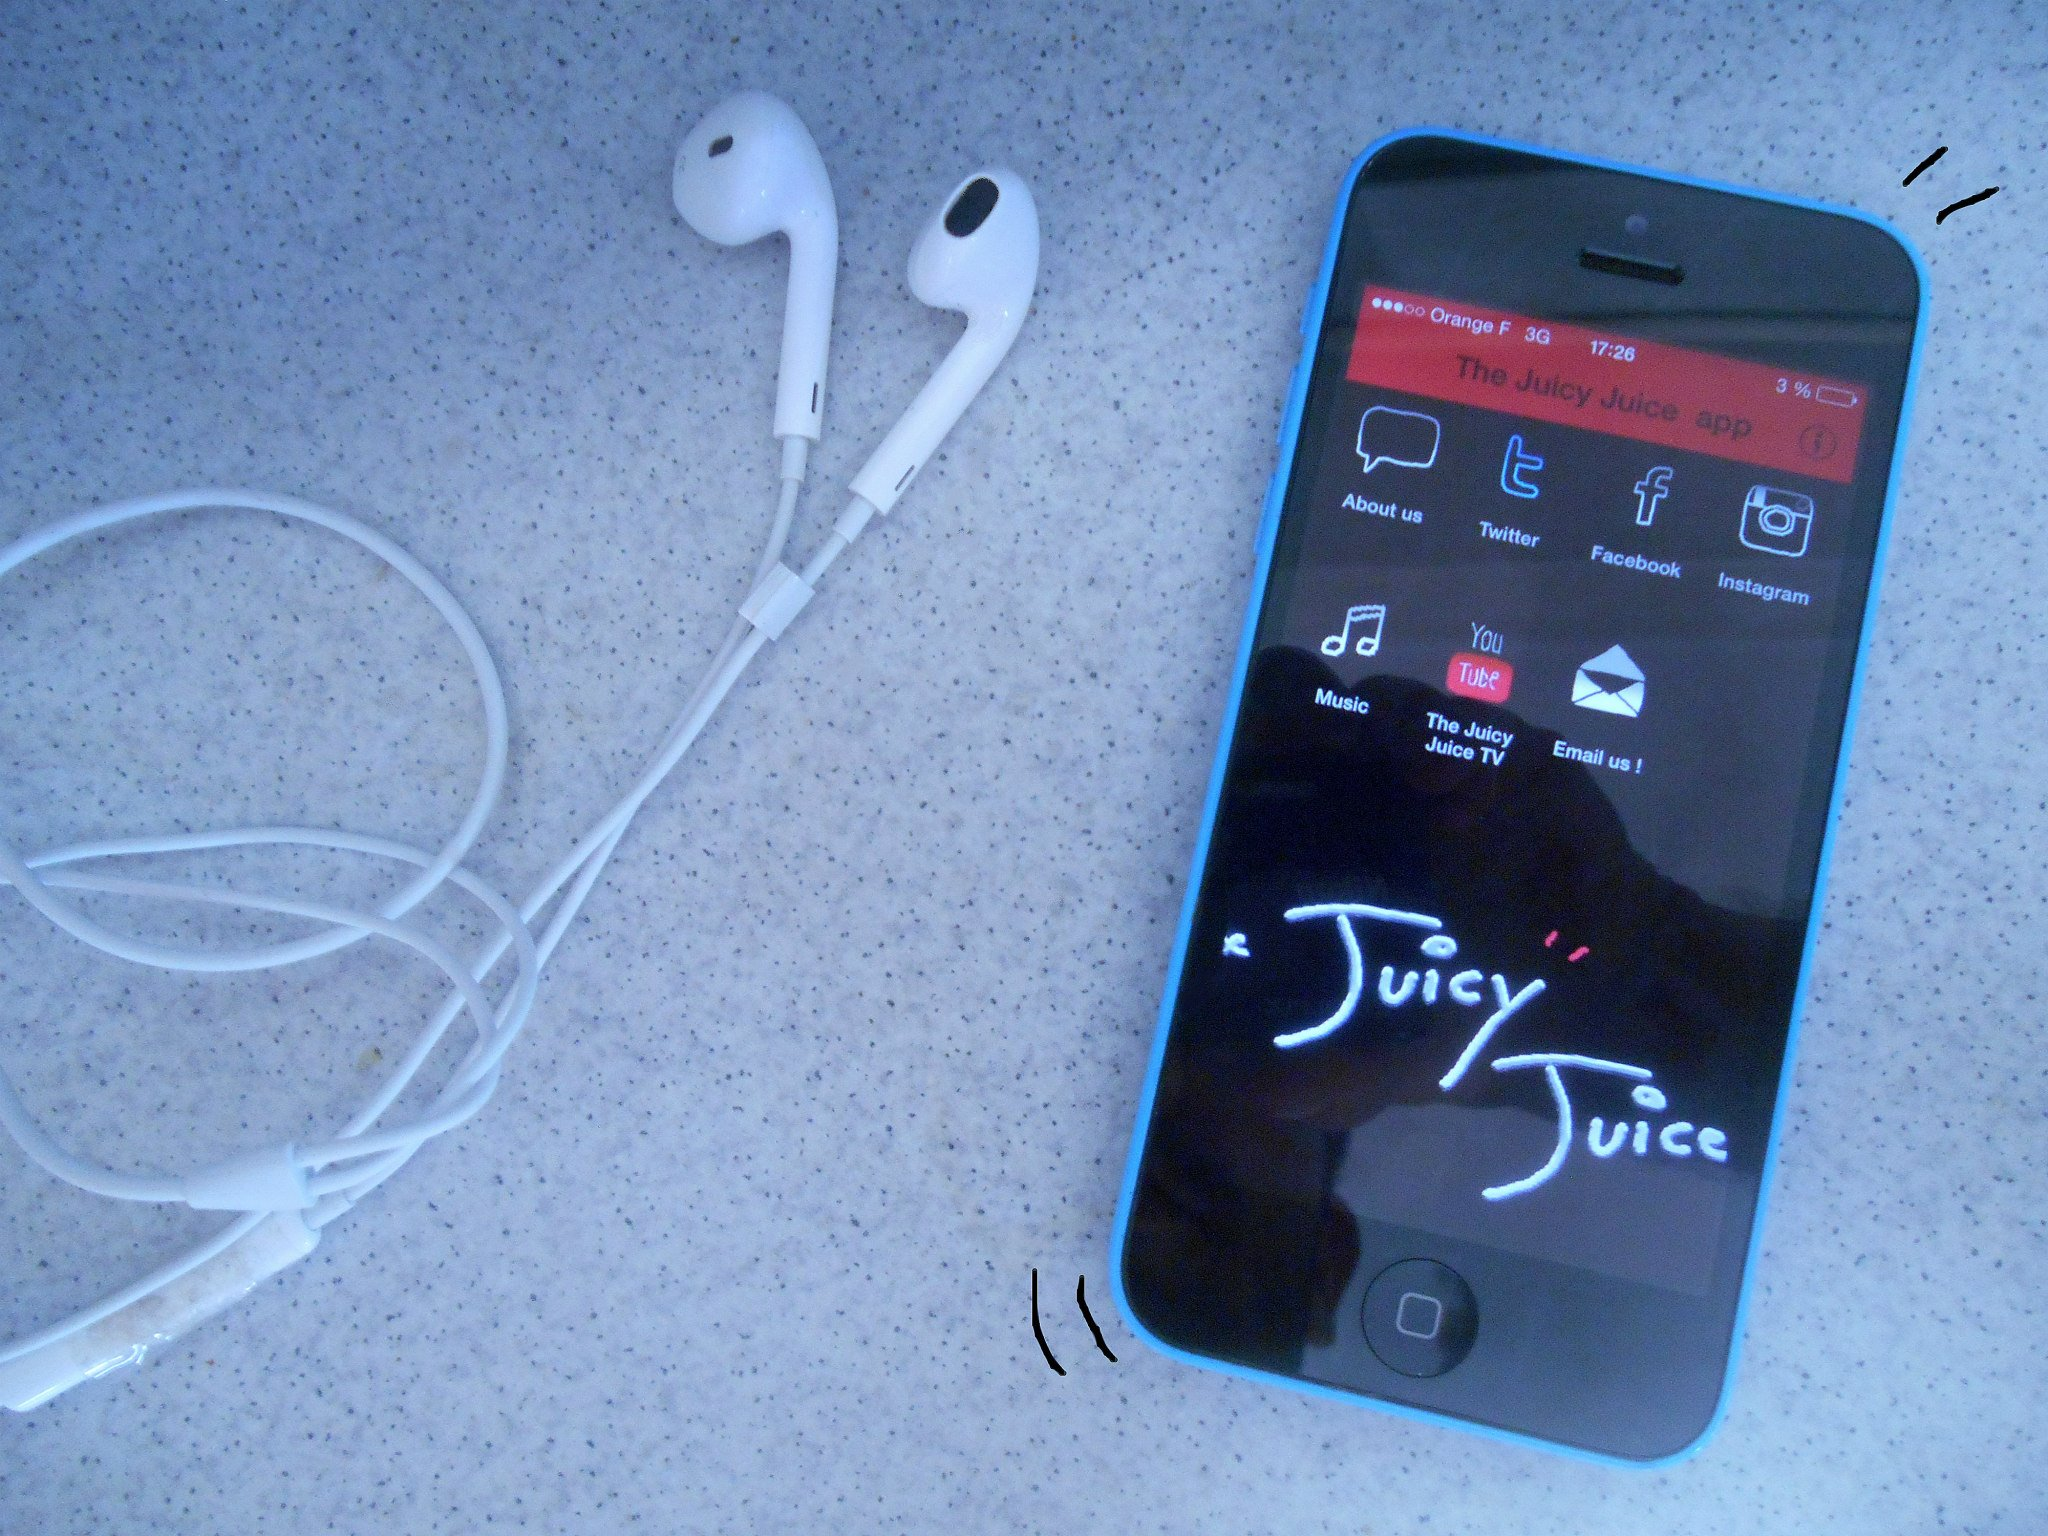 The Juicy Juice app